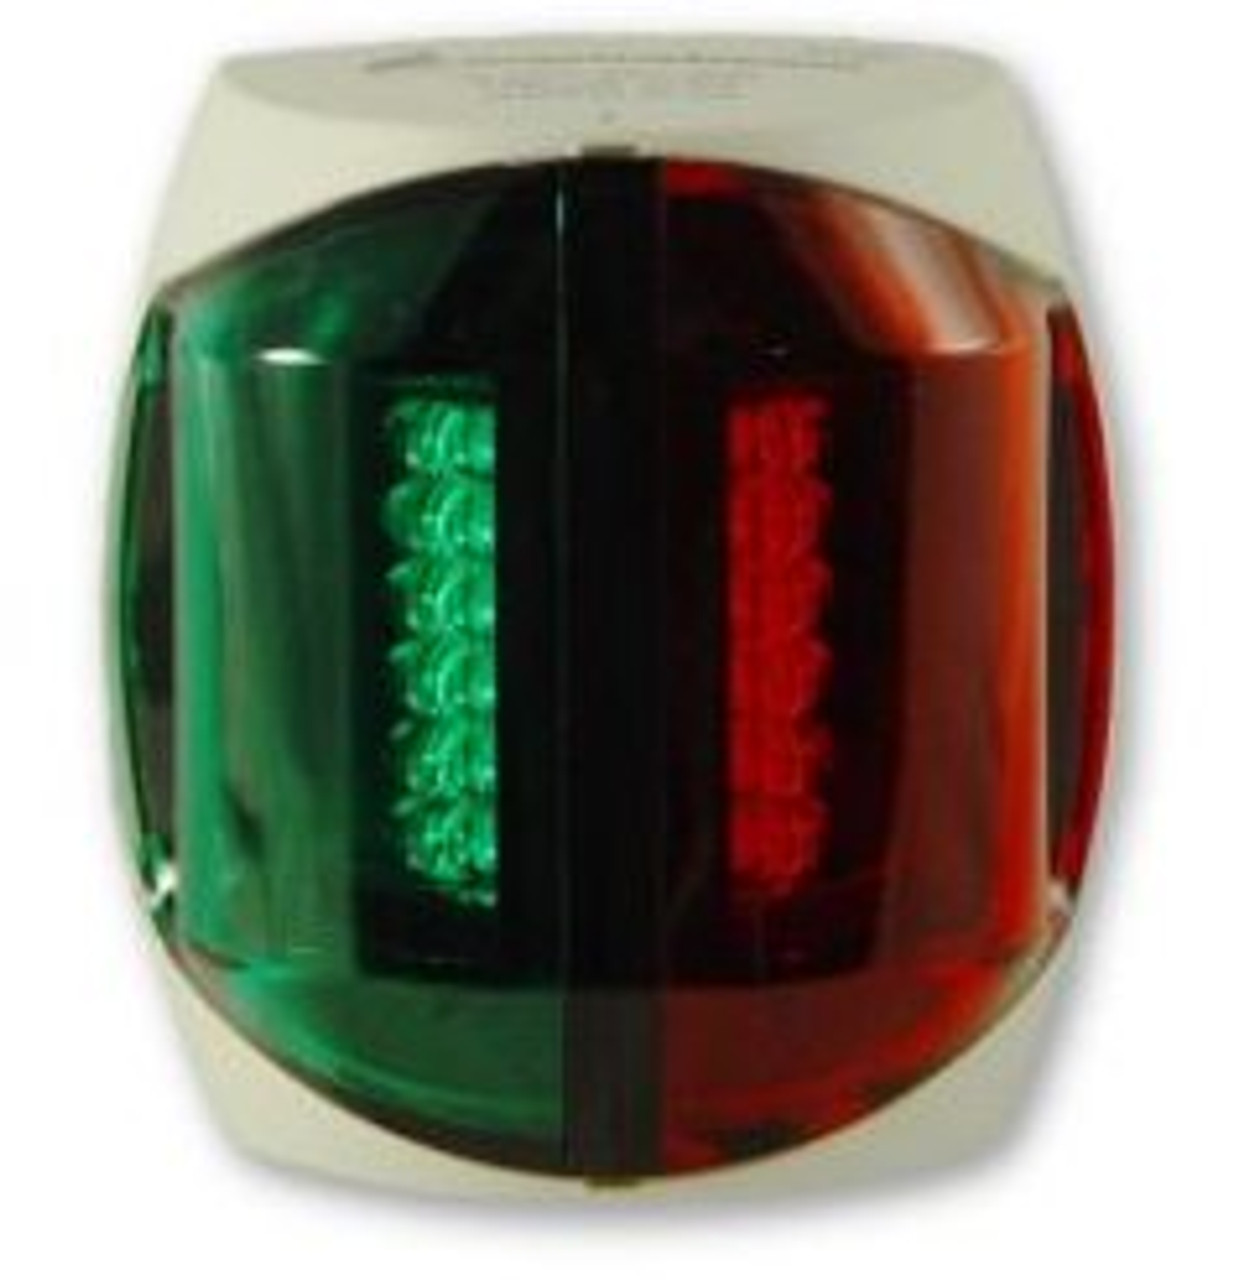 LED Bi-Color Bow Navigation Light - White Hsg